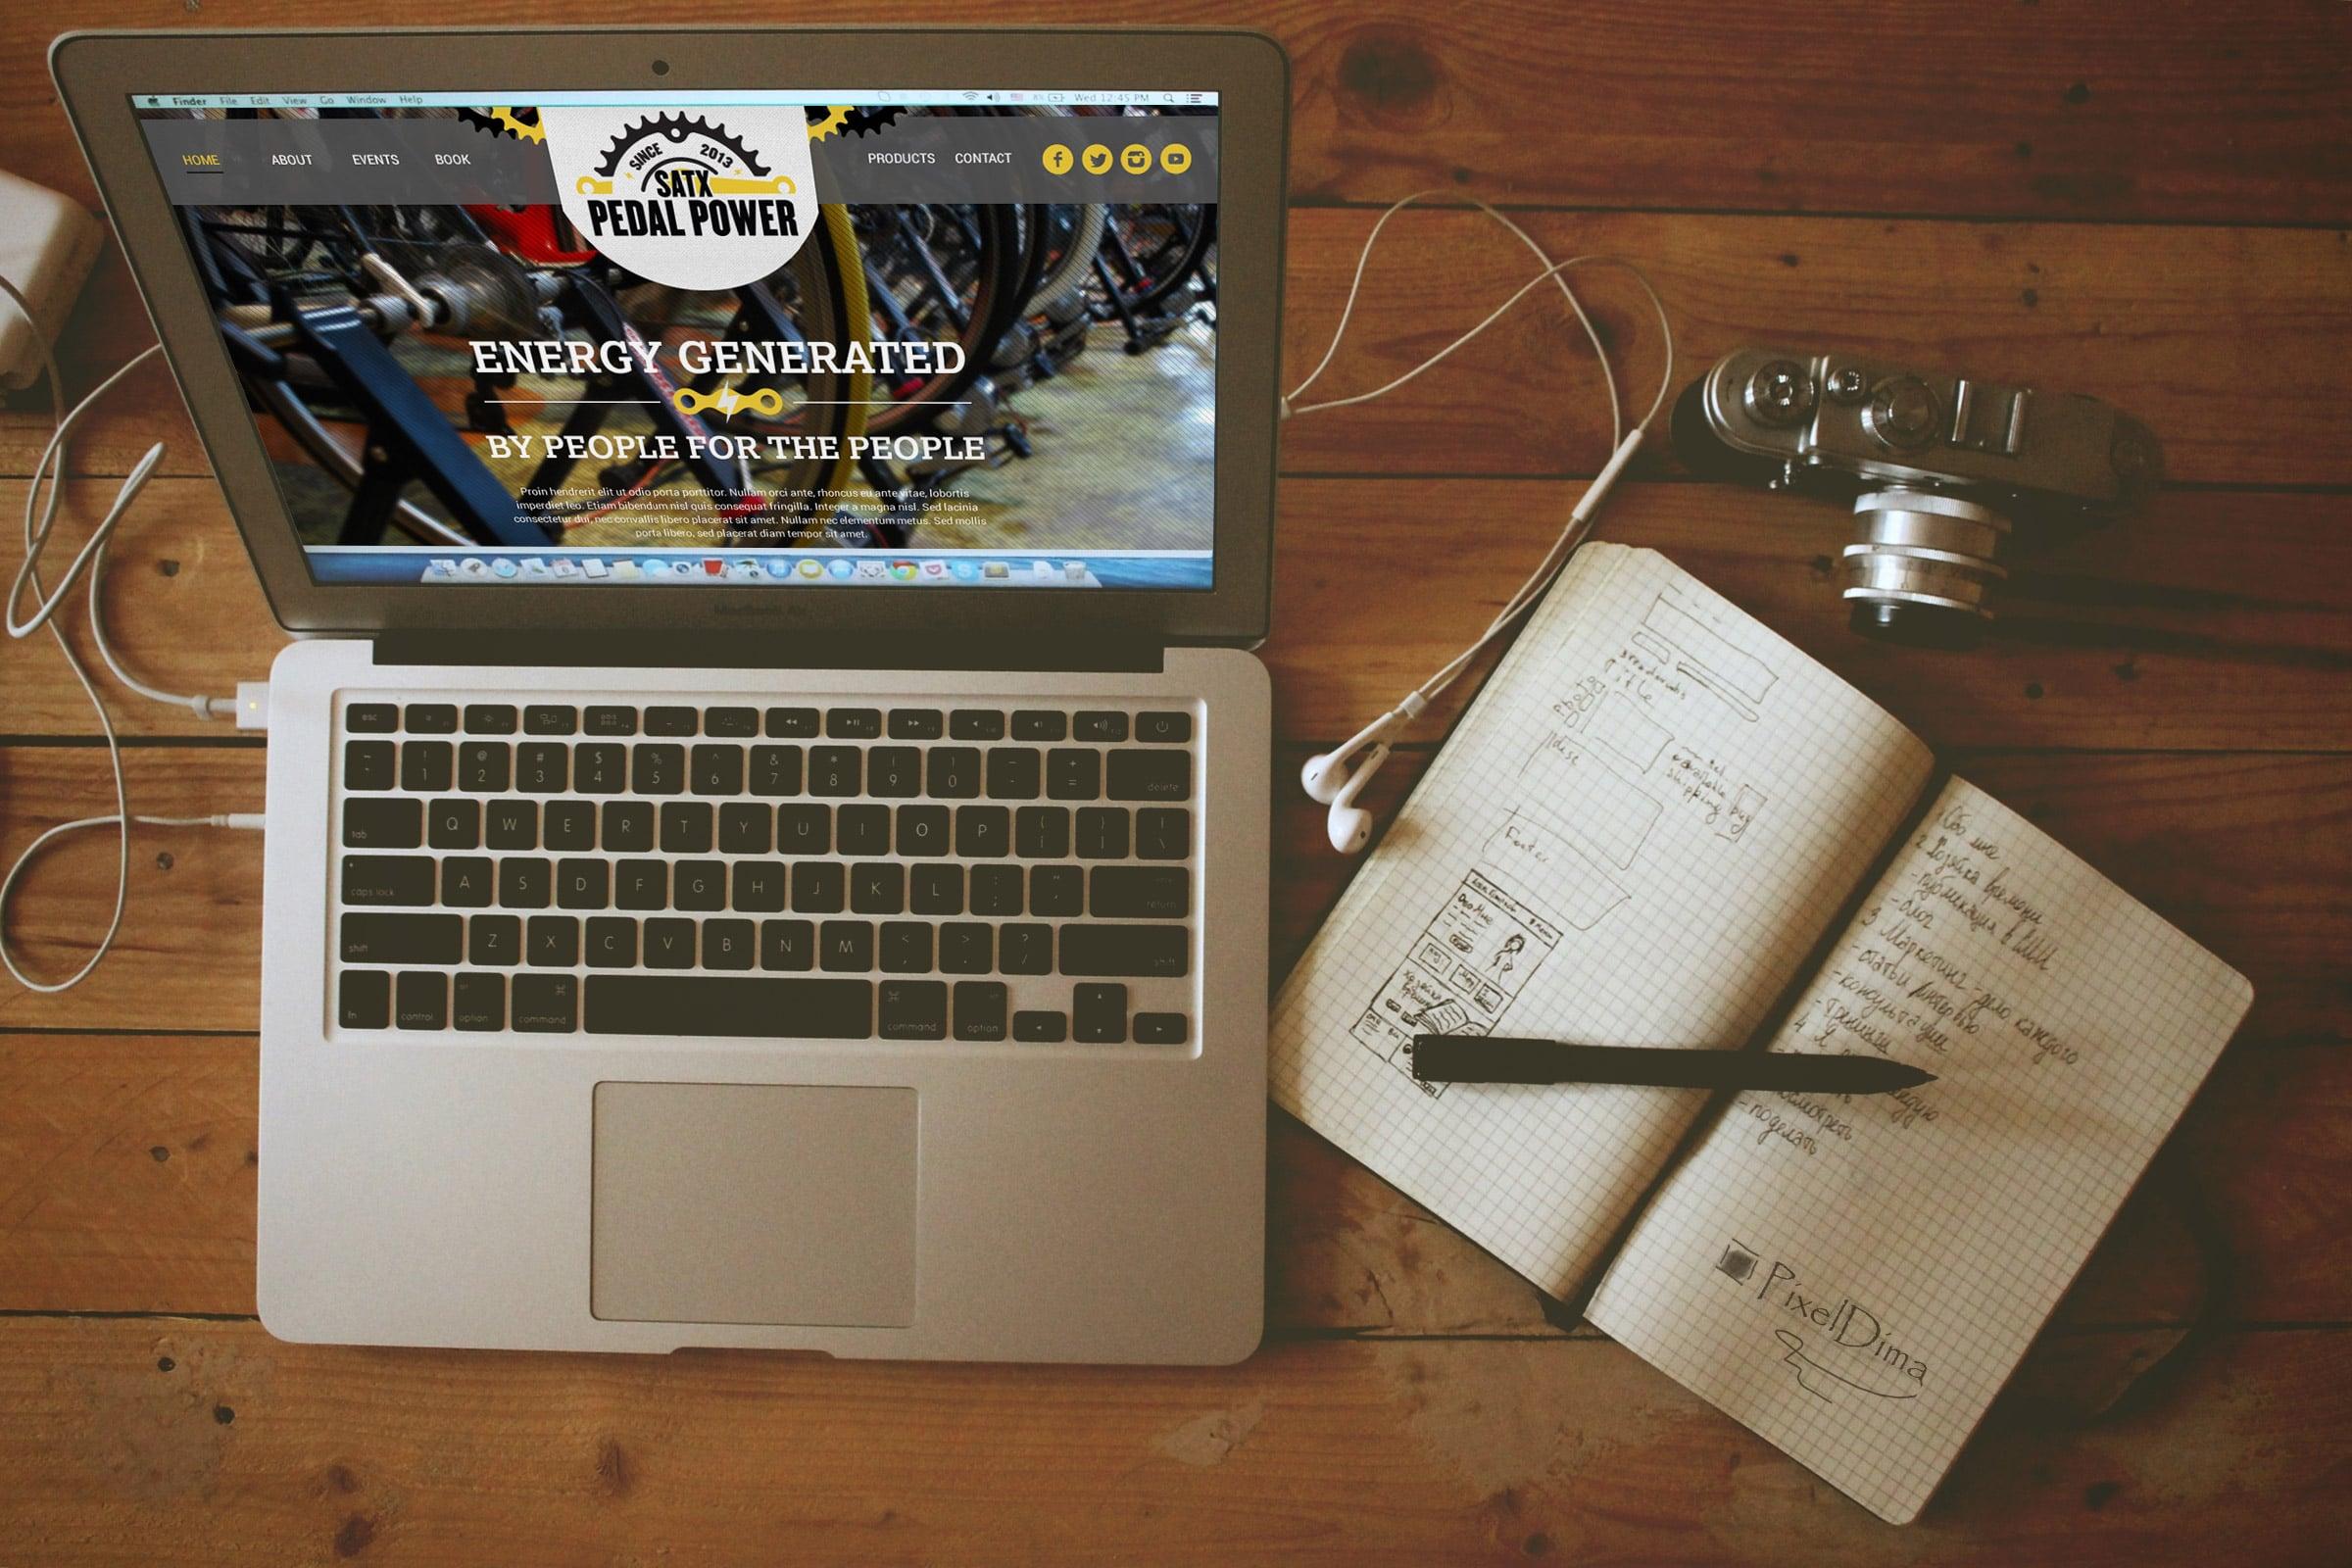 San Antonio Web Design Pedal power Website